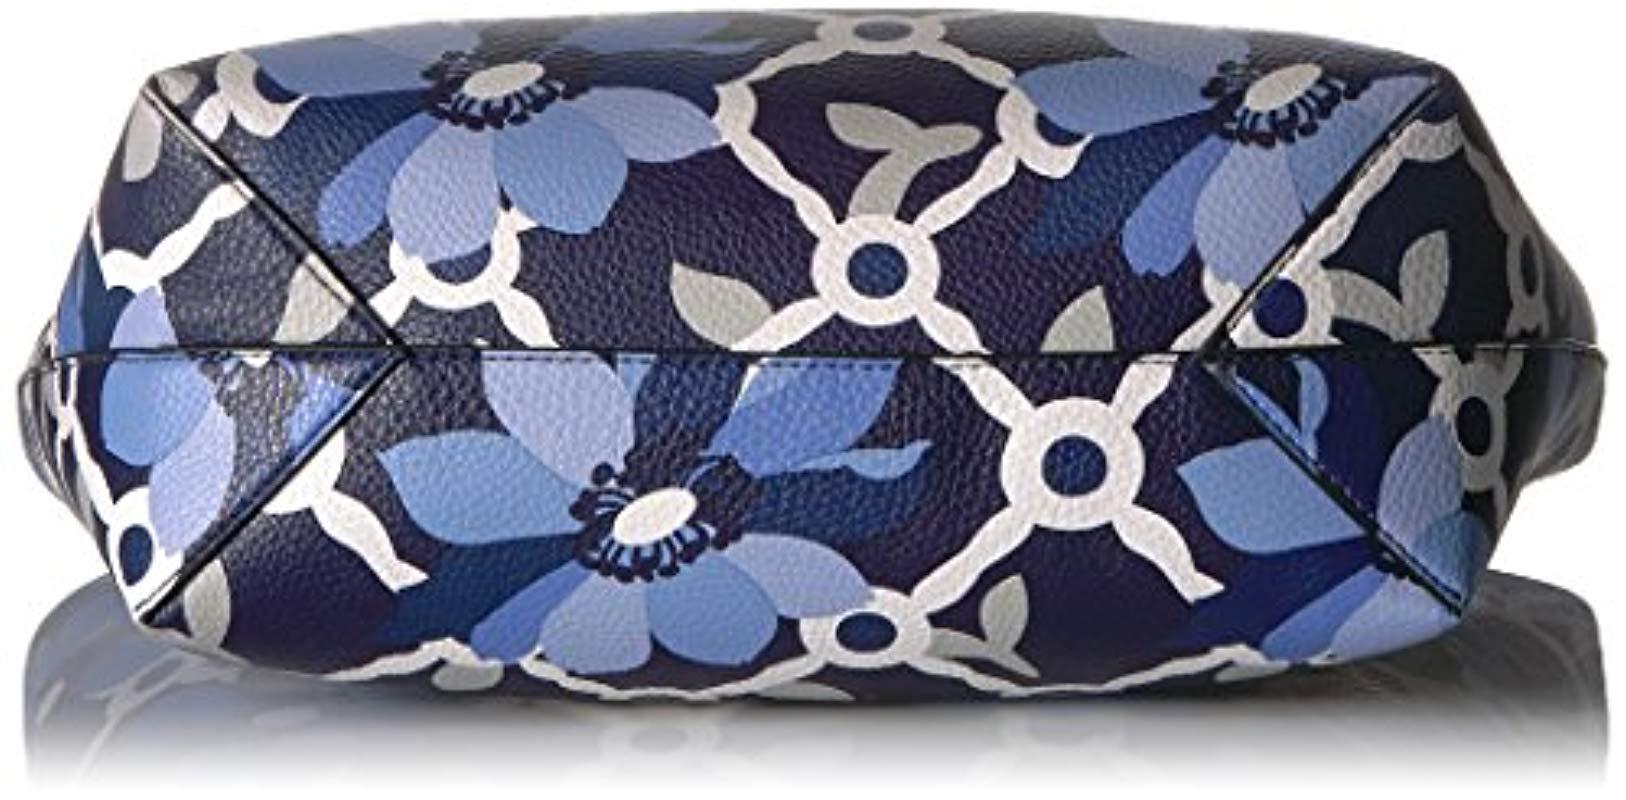 599c503ec8e7 Lyst - Guess Bobbi Floral Inside Out Tote in Blue